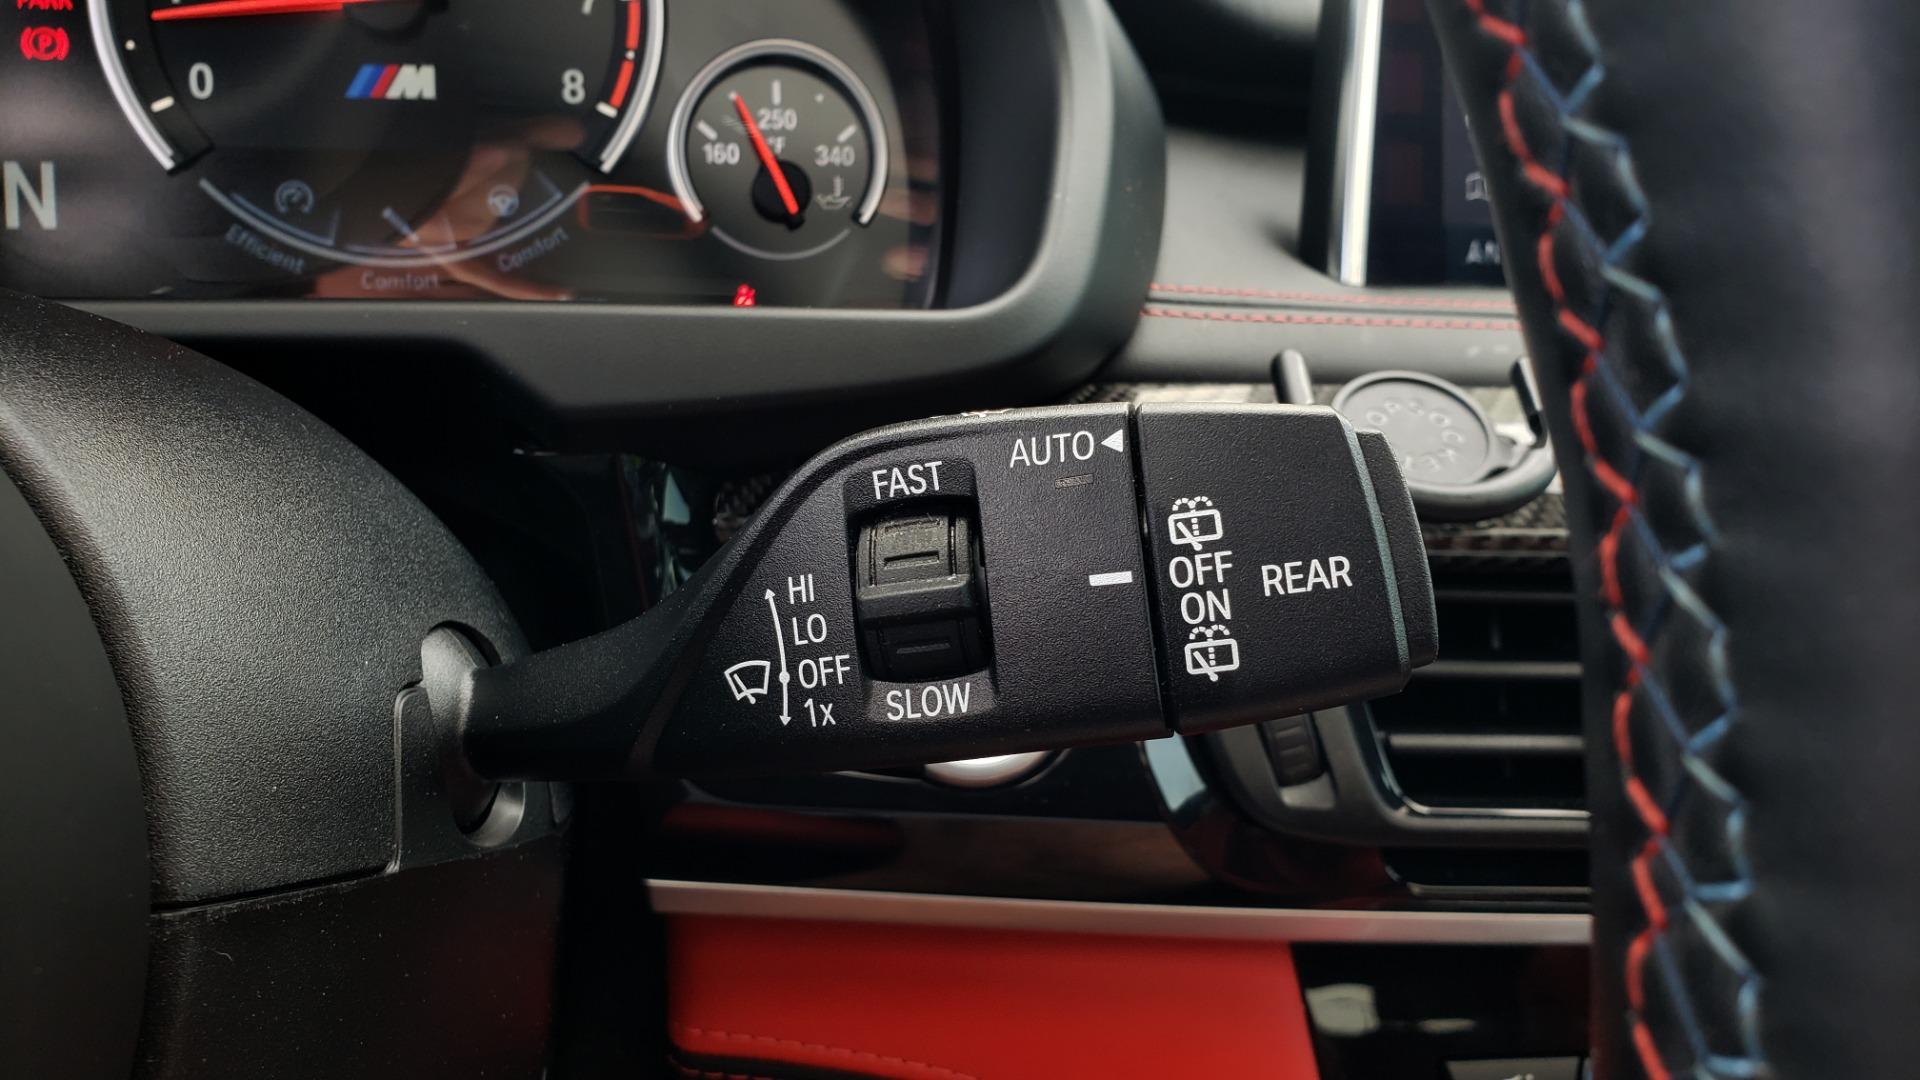 Used 2017 BMW X5 M EXECUTIVE PKG / NAV / DRVR ASST / BSM / HUD / HTD STS / WIFI for sale Sold at Formula Imports in Charlotte NC 28227 44